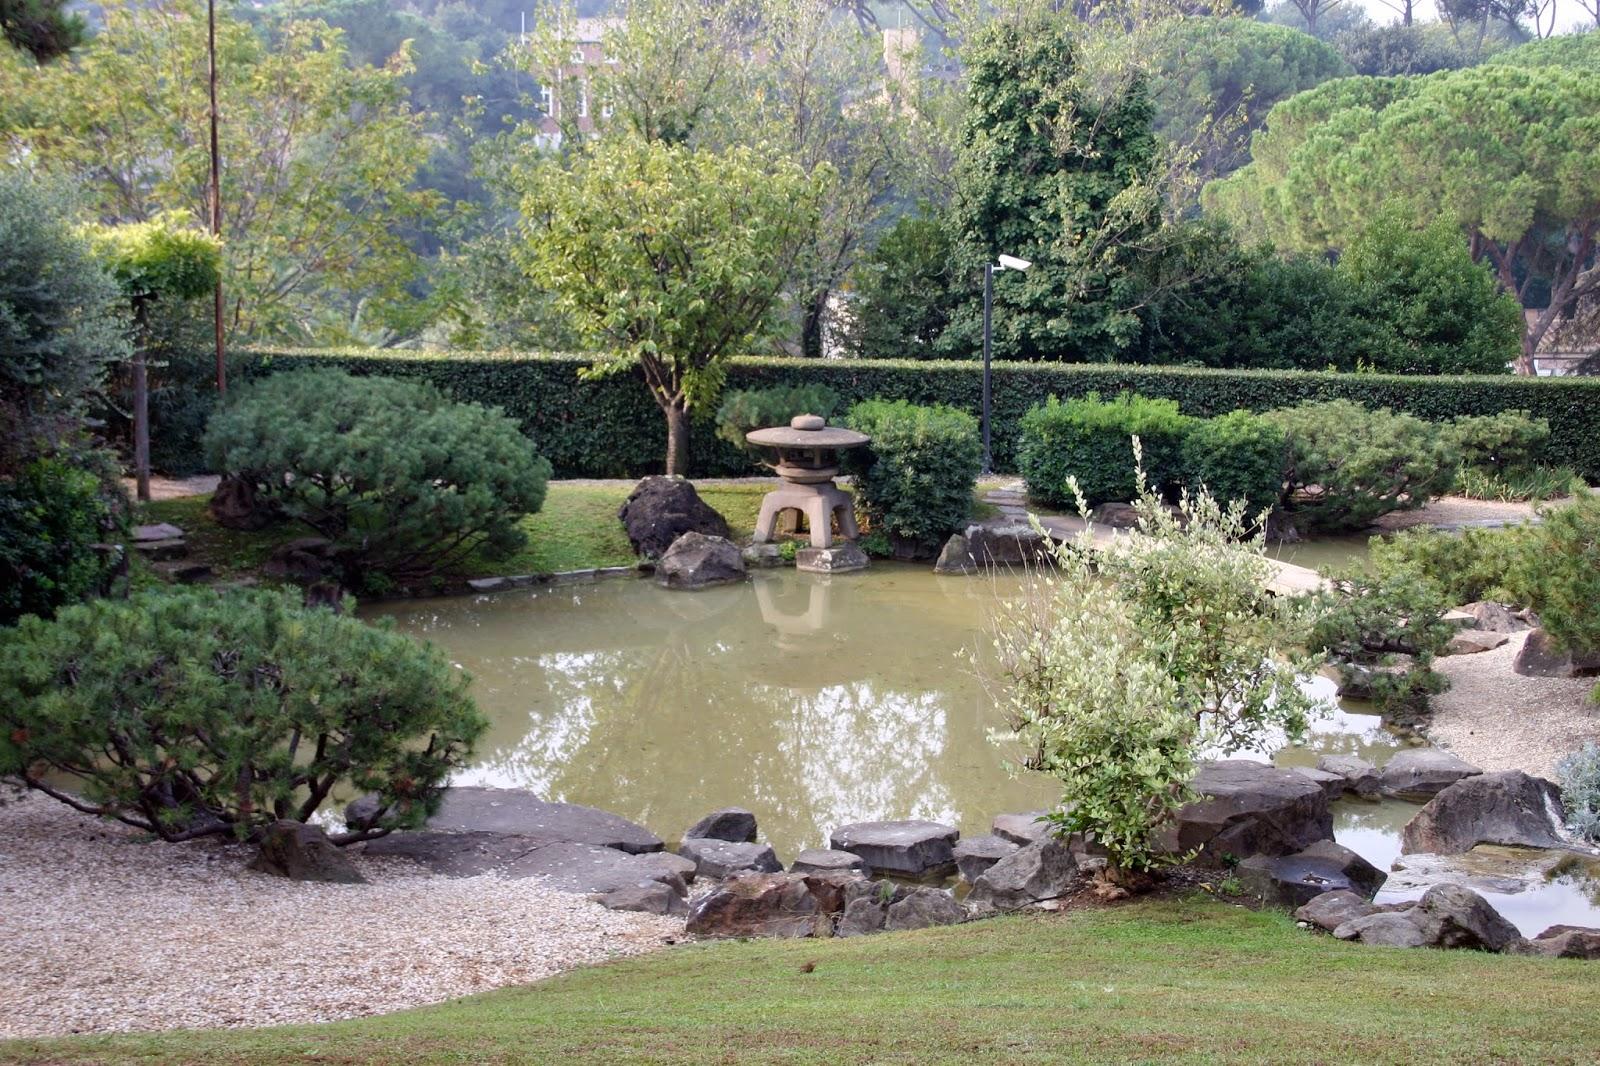 Il giardino giapponese a roma rome insider - Giardini giapponesi ...